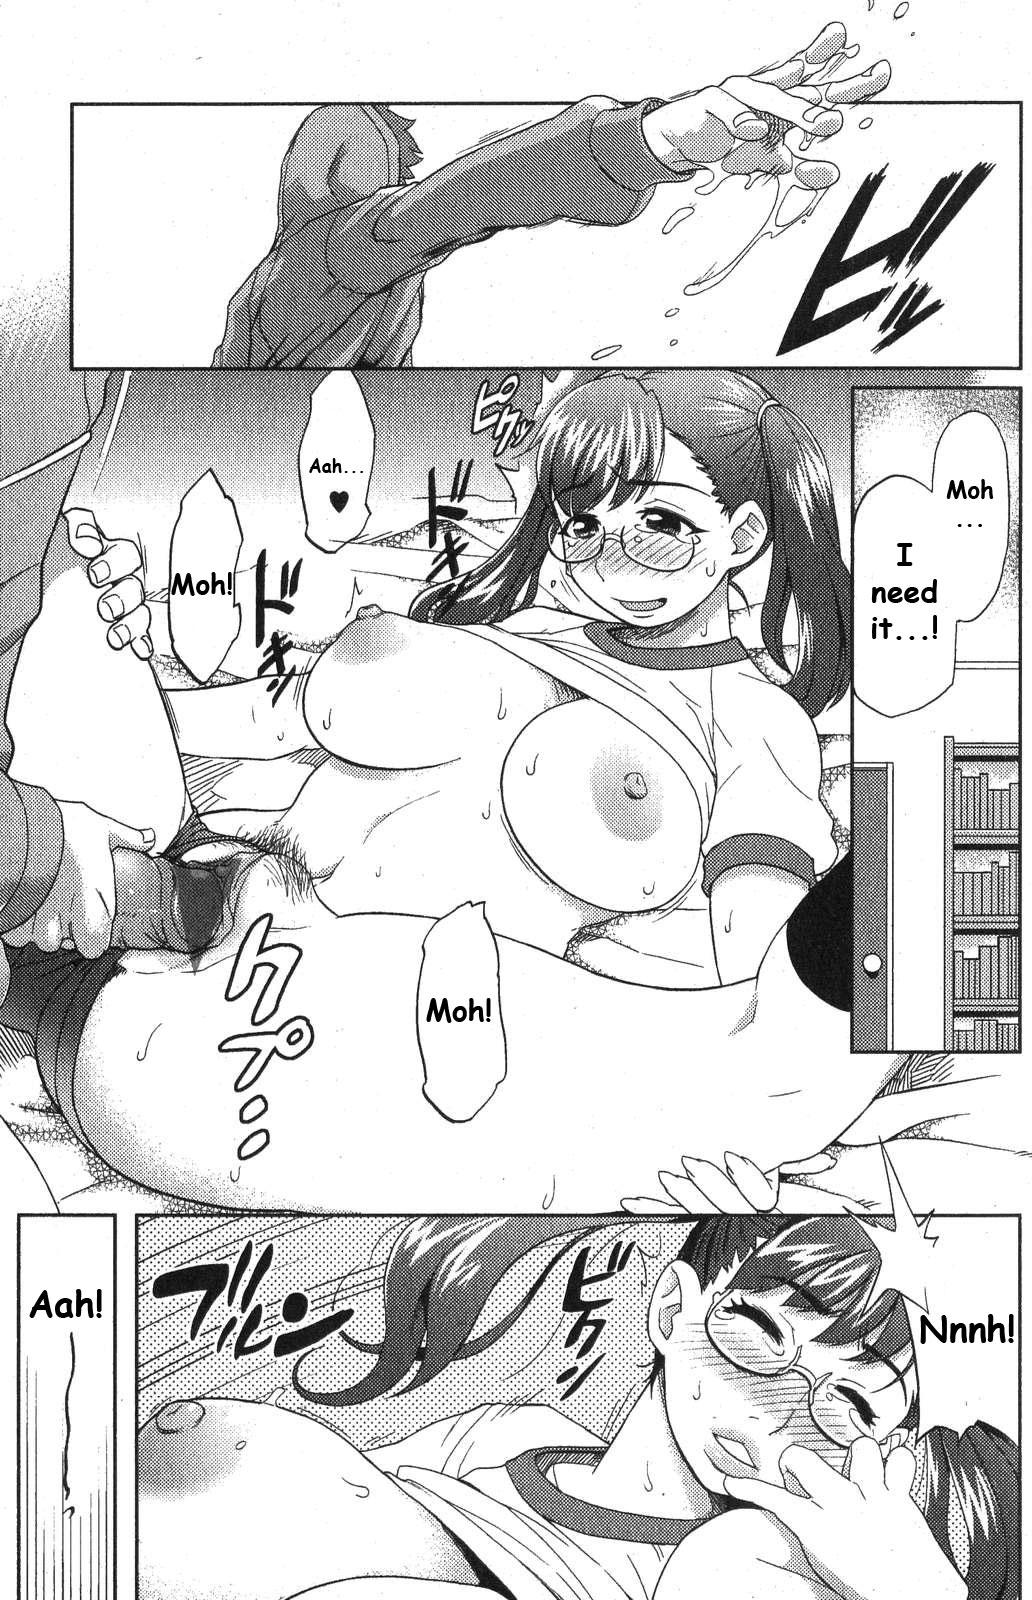 50116_omachikane_www.hentairules.net_11_123_389lo.jpg